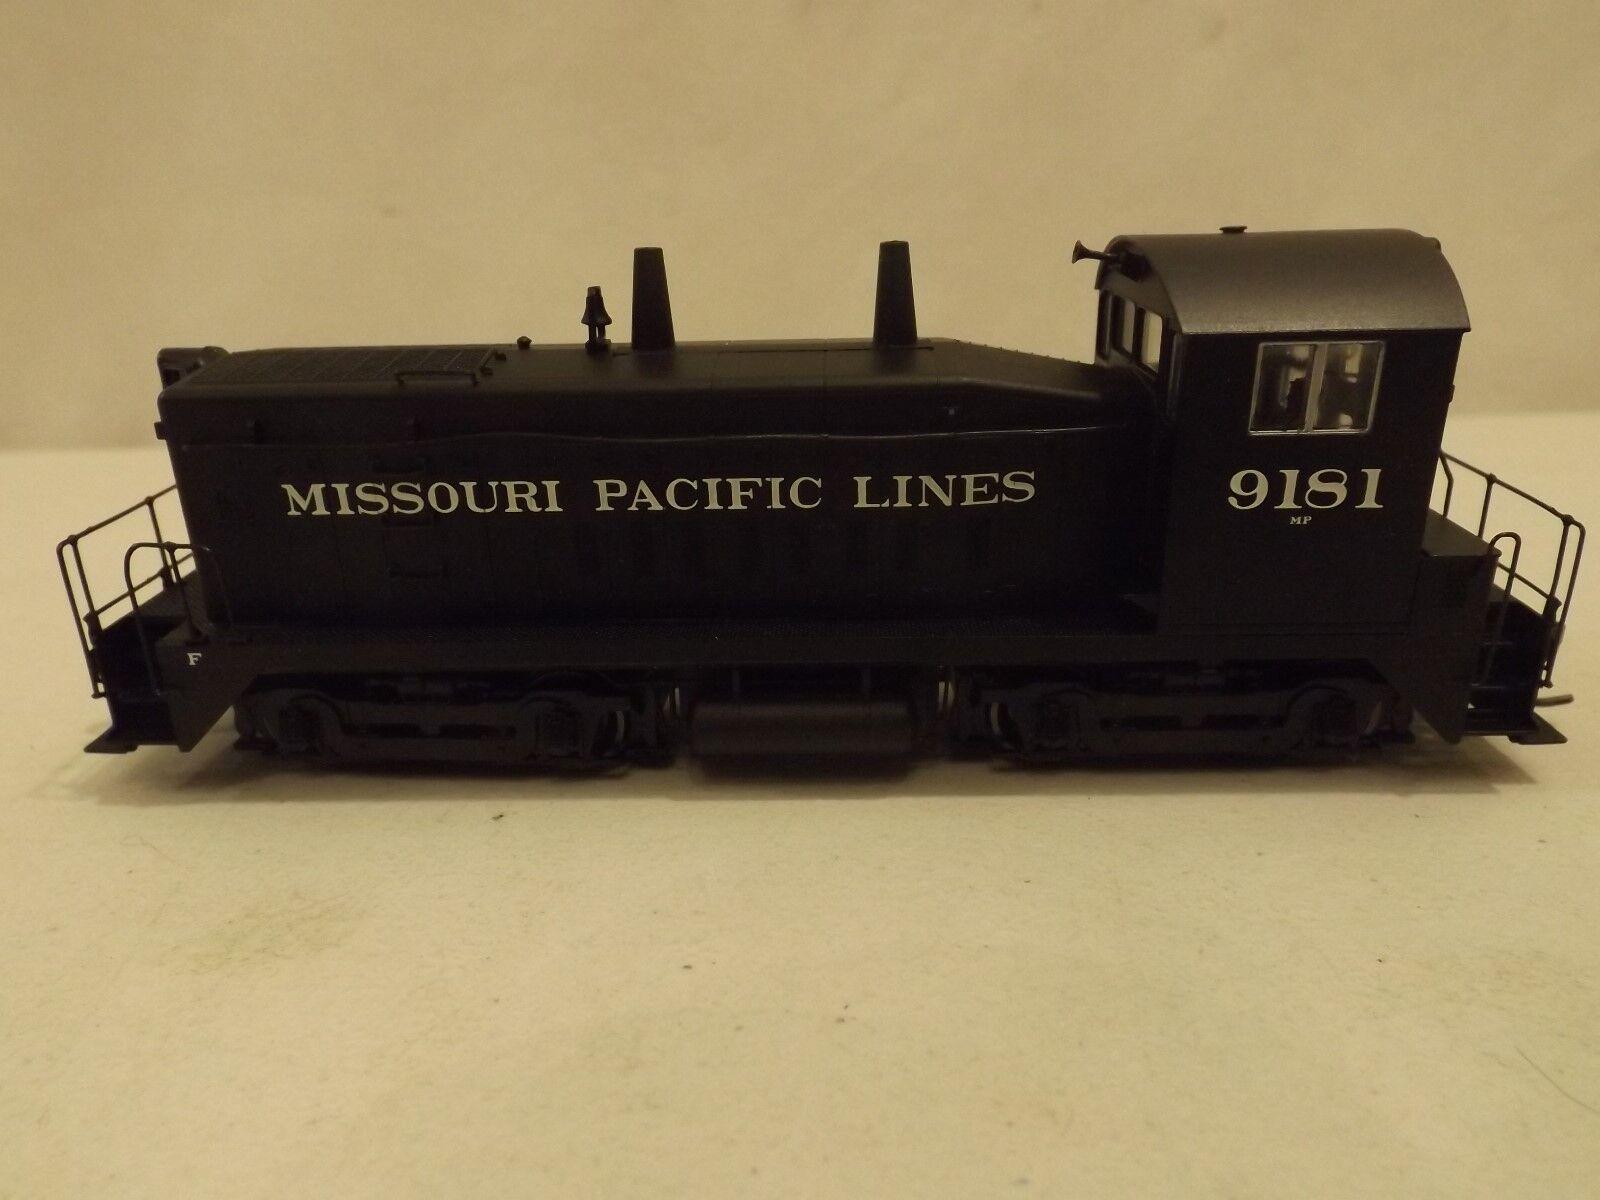 HO Prossoo 2000 Missouri Pacific SW9 1200 diesel engine in original box